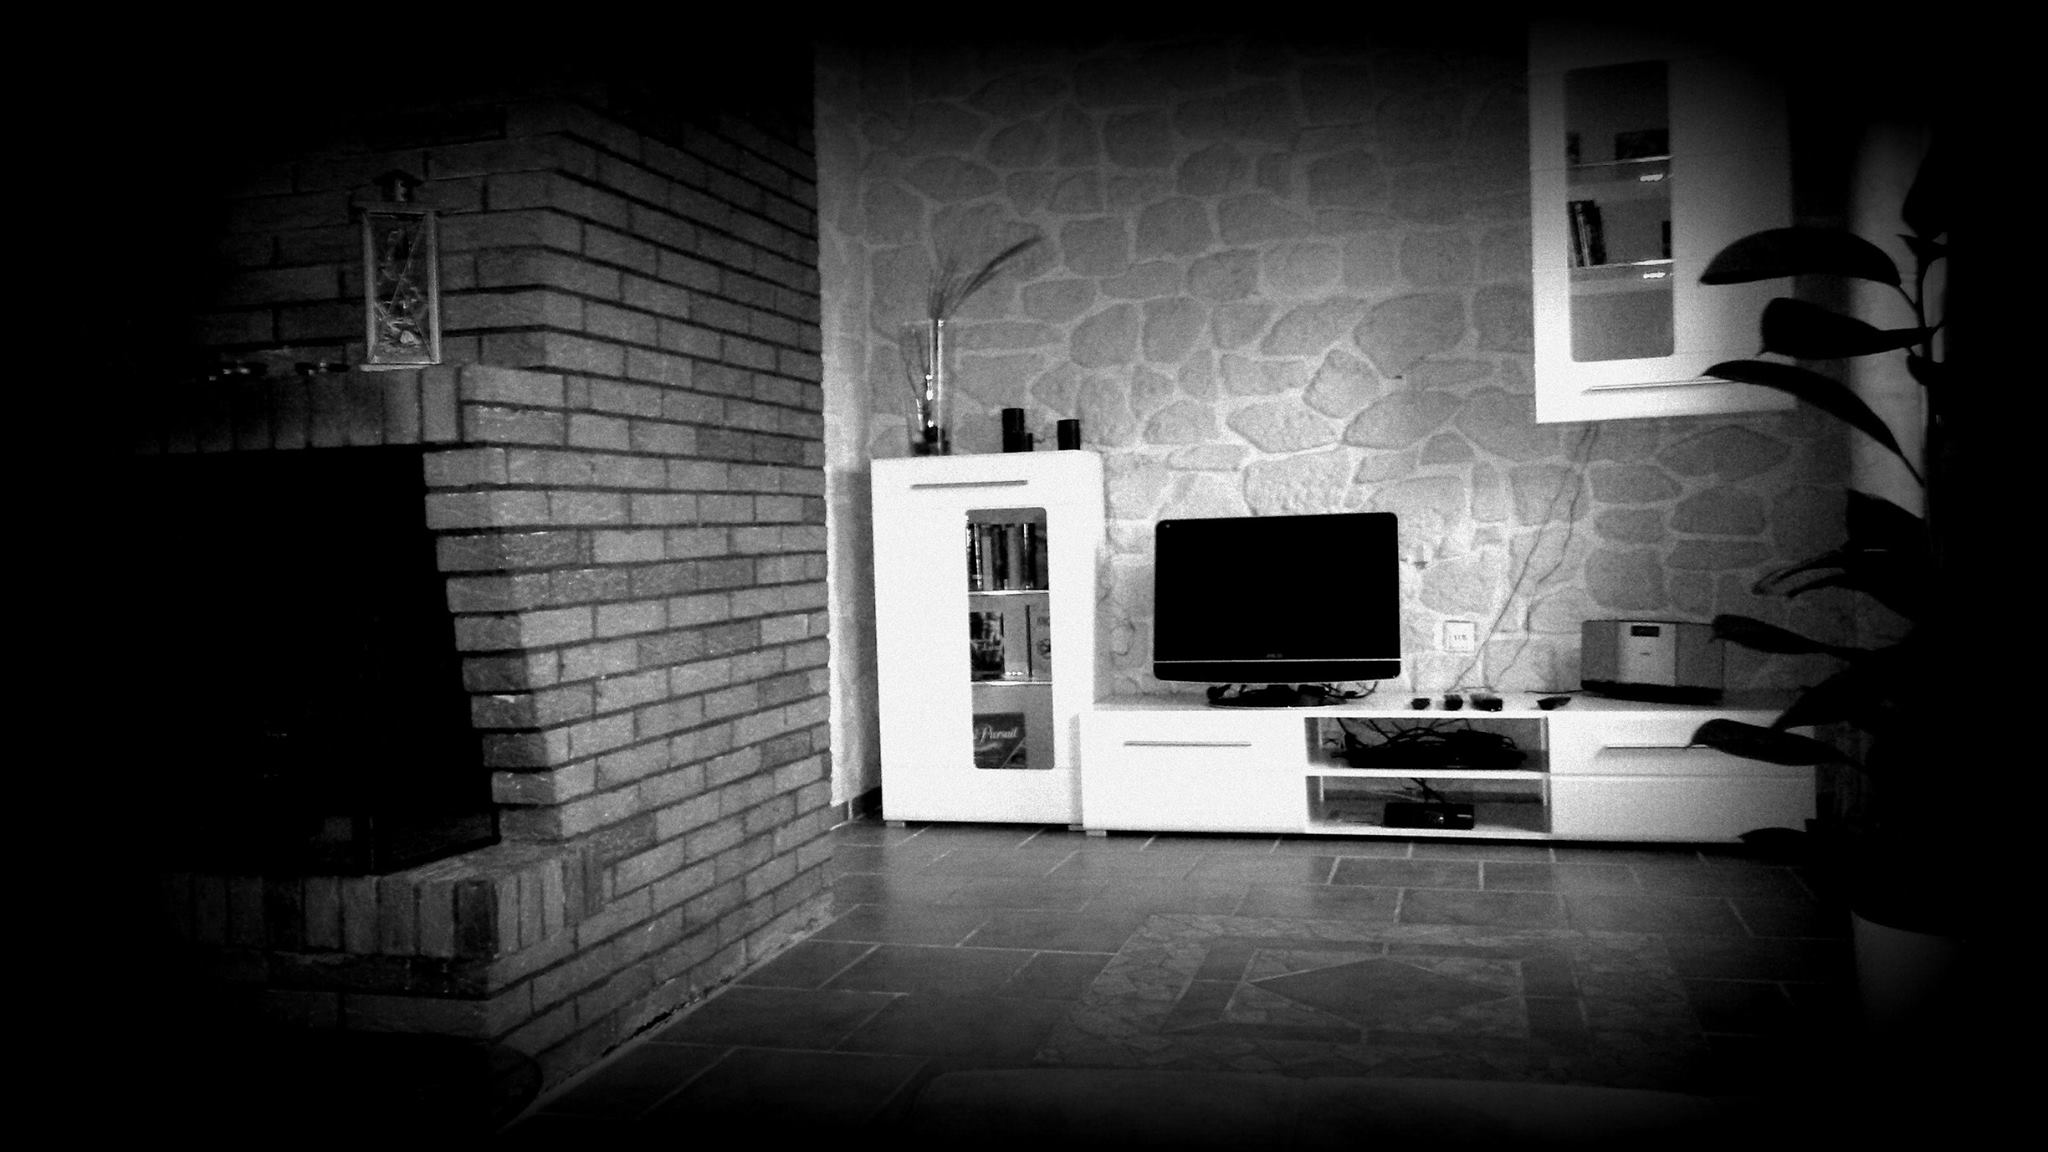 15068869 1269253659811312 2759621224614469460 o bdsm for Haus mieten in ostfriesland